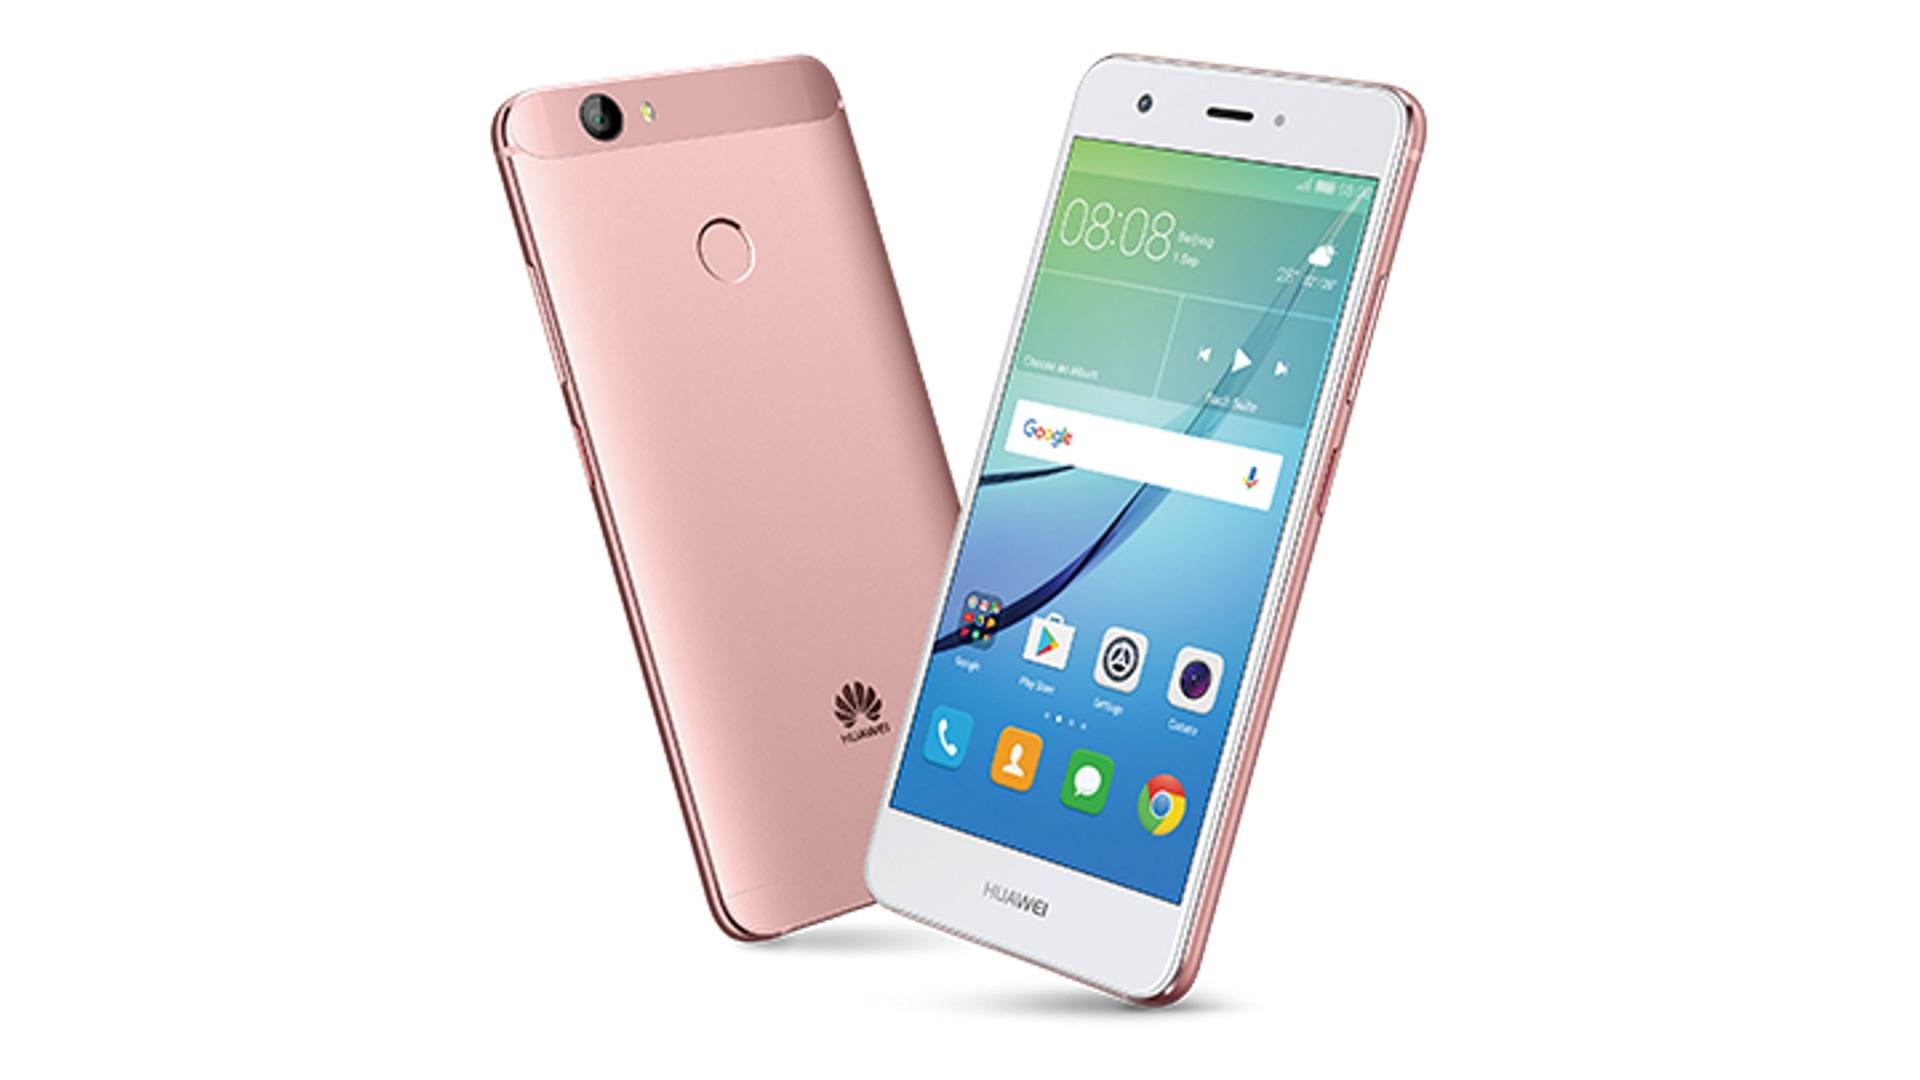 Huawei Japan、「Huawei nova」の Android 7.0 アップデートと「Huawei nova lite」のソフトウェアアップデートを開始